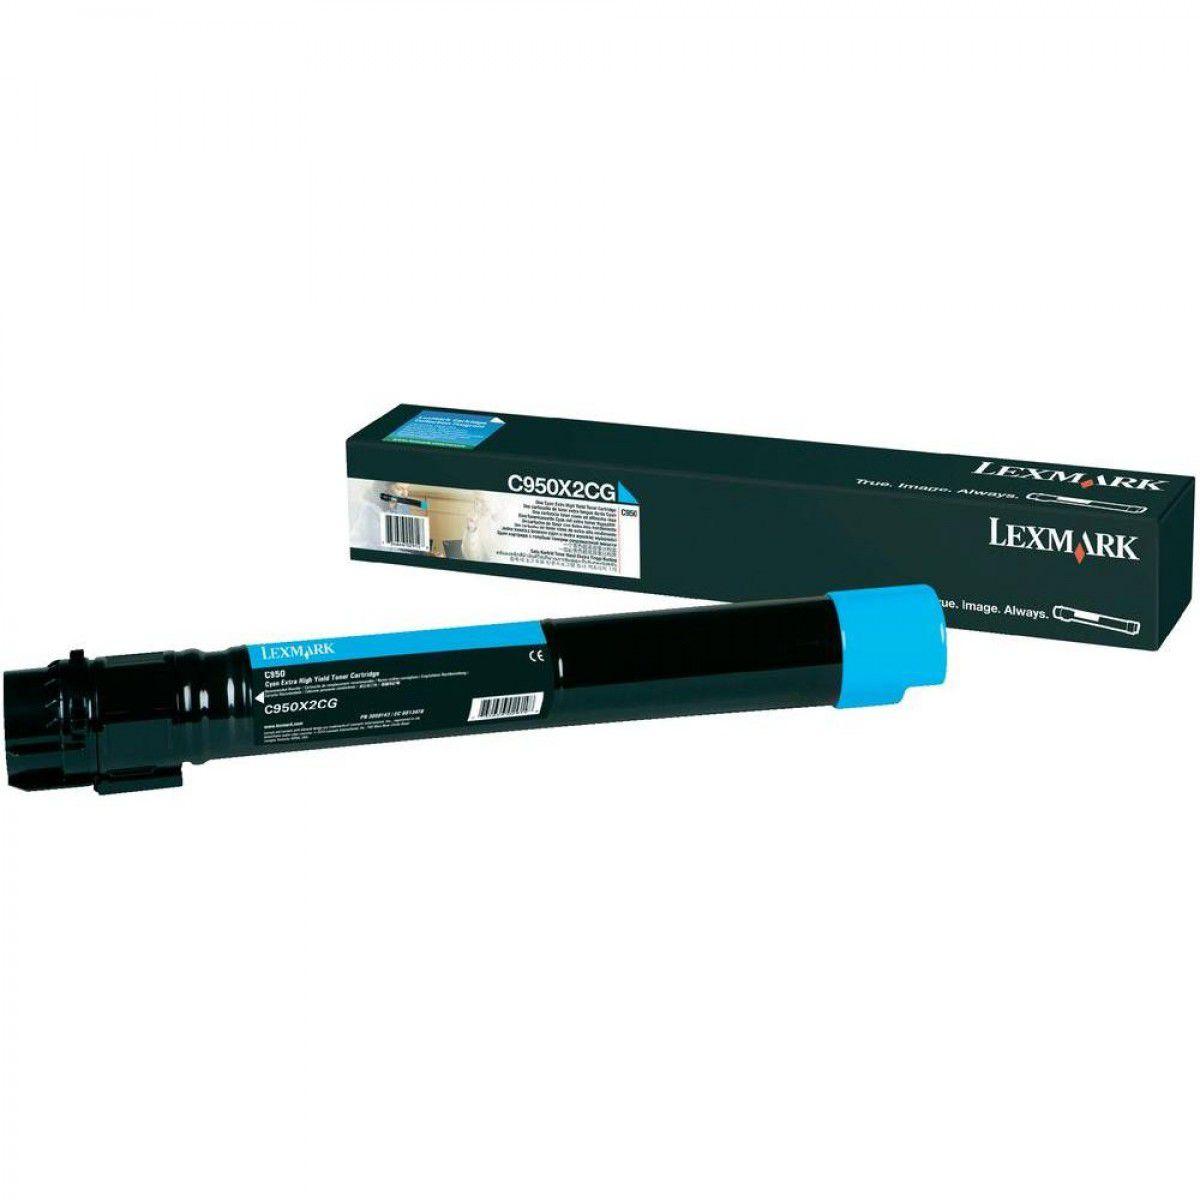 Cartucho Toner Lexmark C950 - 22K - Ciano - C950X2CG